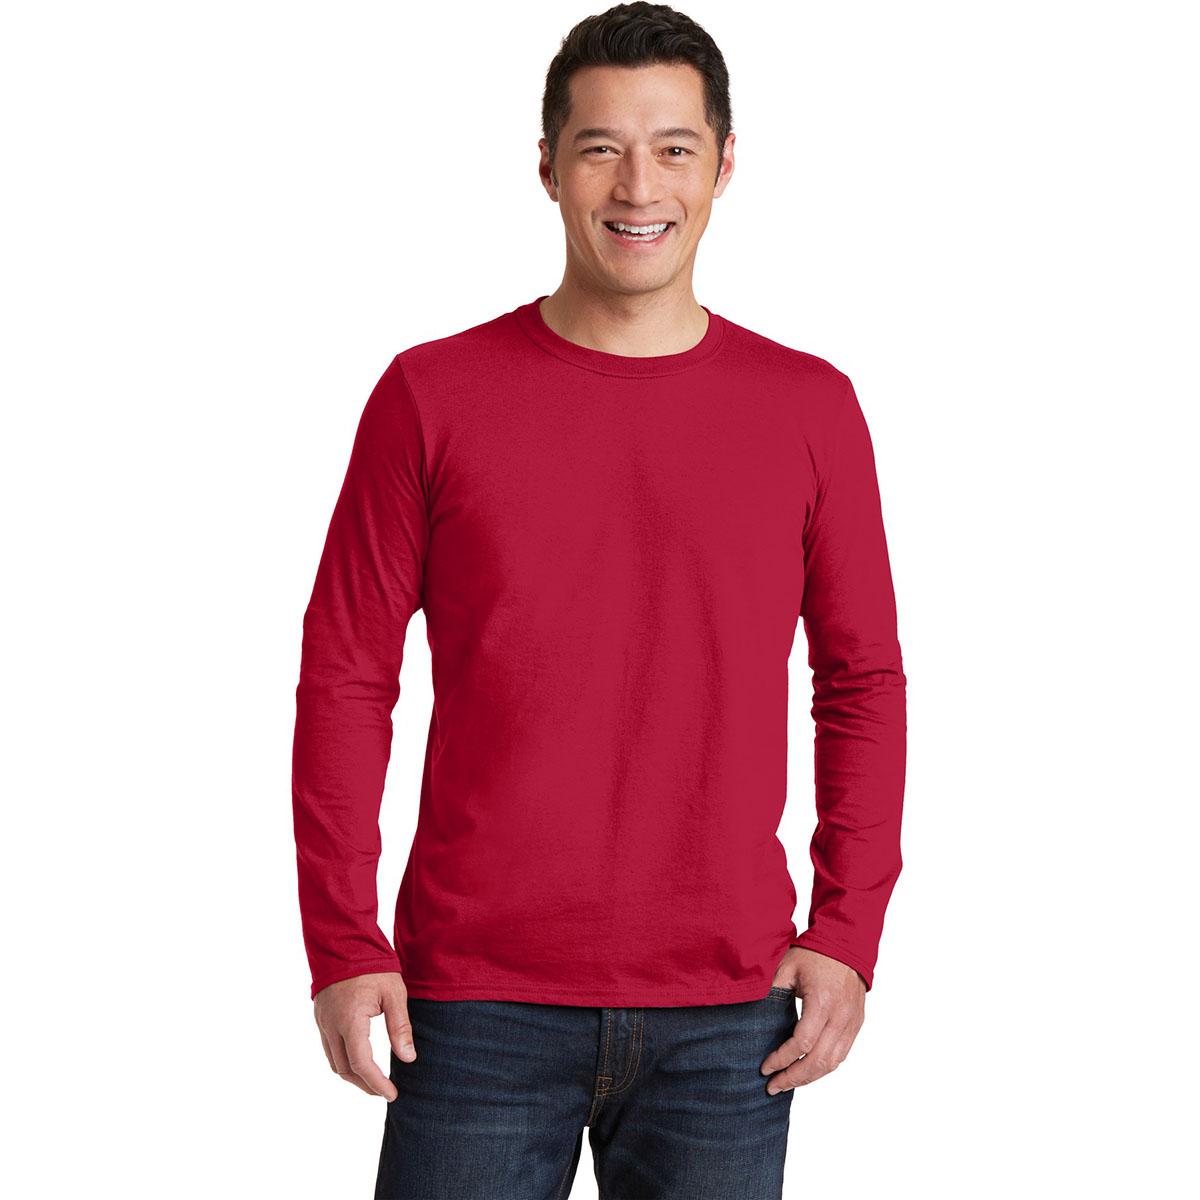 gildan 64400 softstyle long sleeve t shirt cherry red